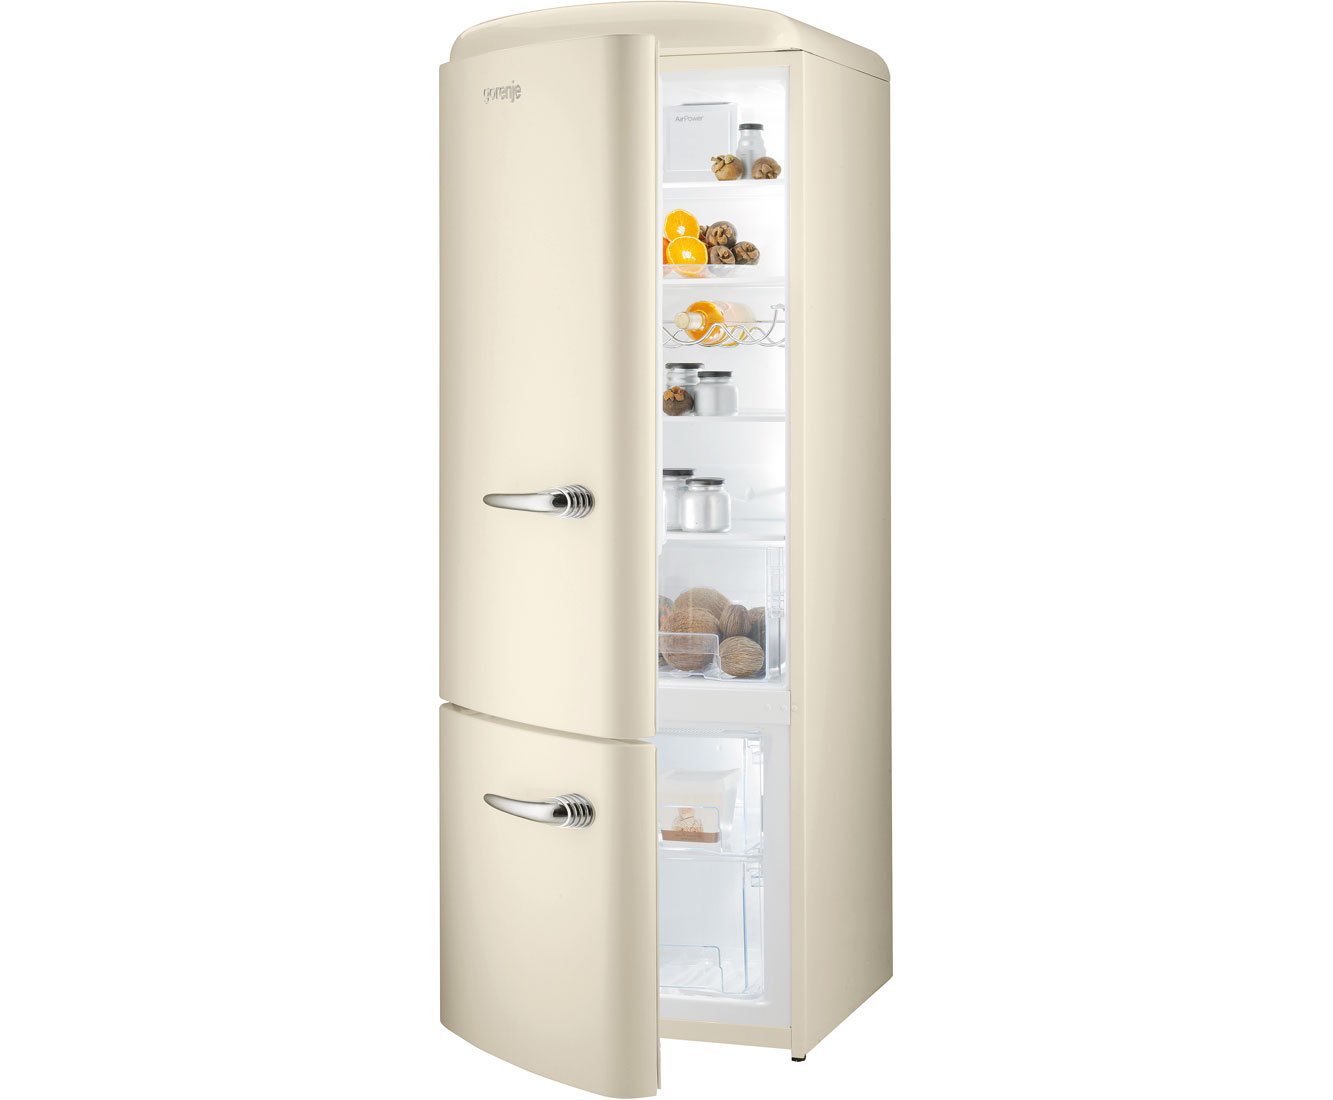 Gorenje Retro Kühlschrank Vw : Gorenje kuehlschrank retro kühl gefrierkombination wohnkultur